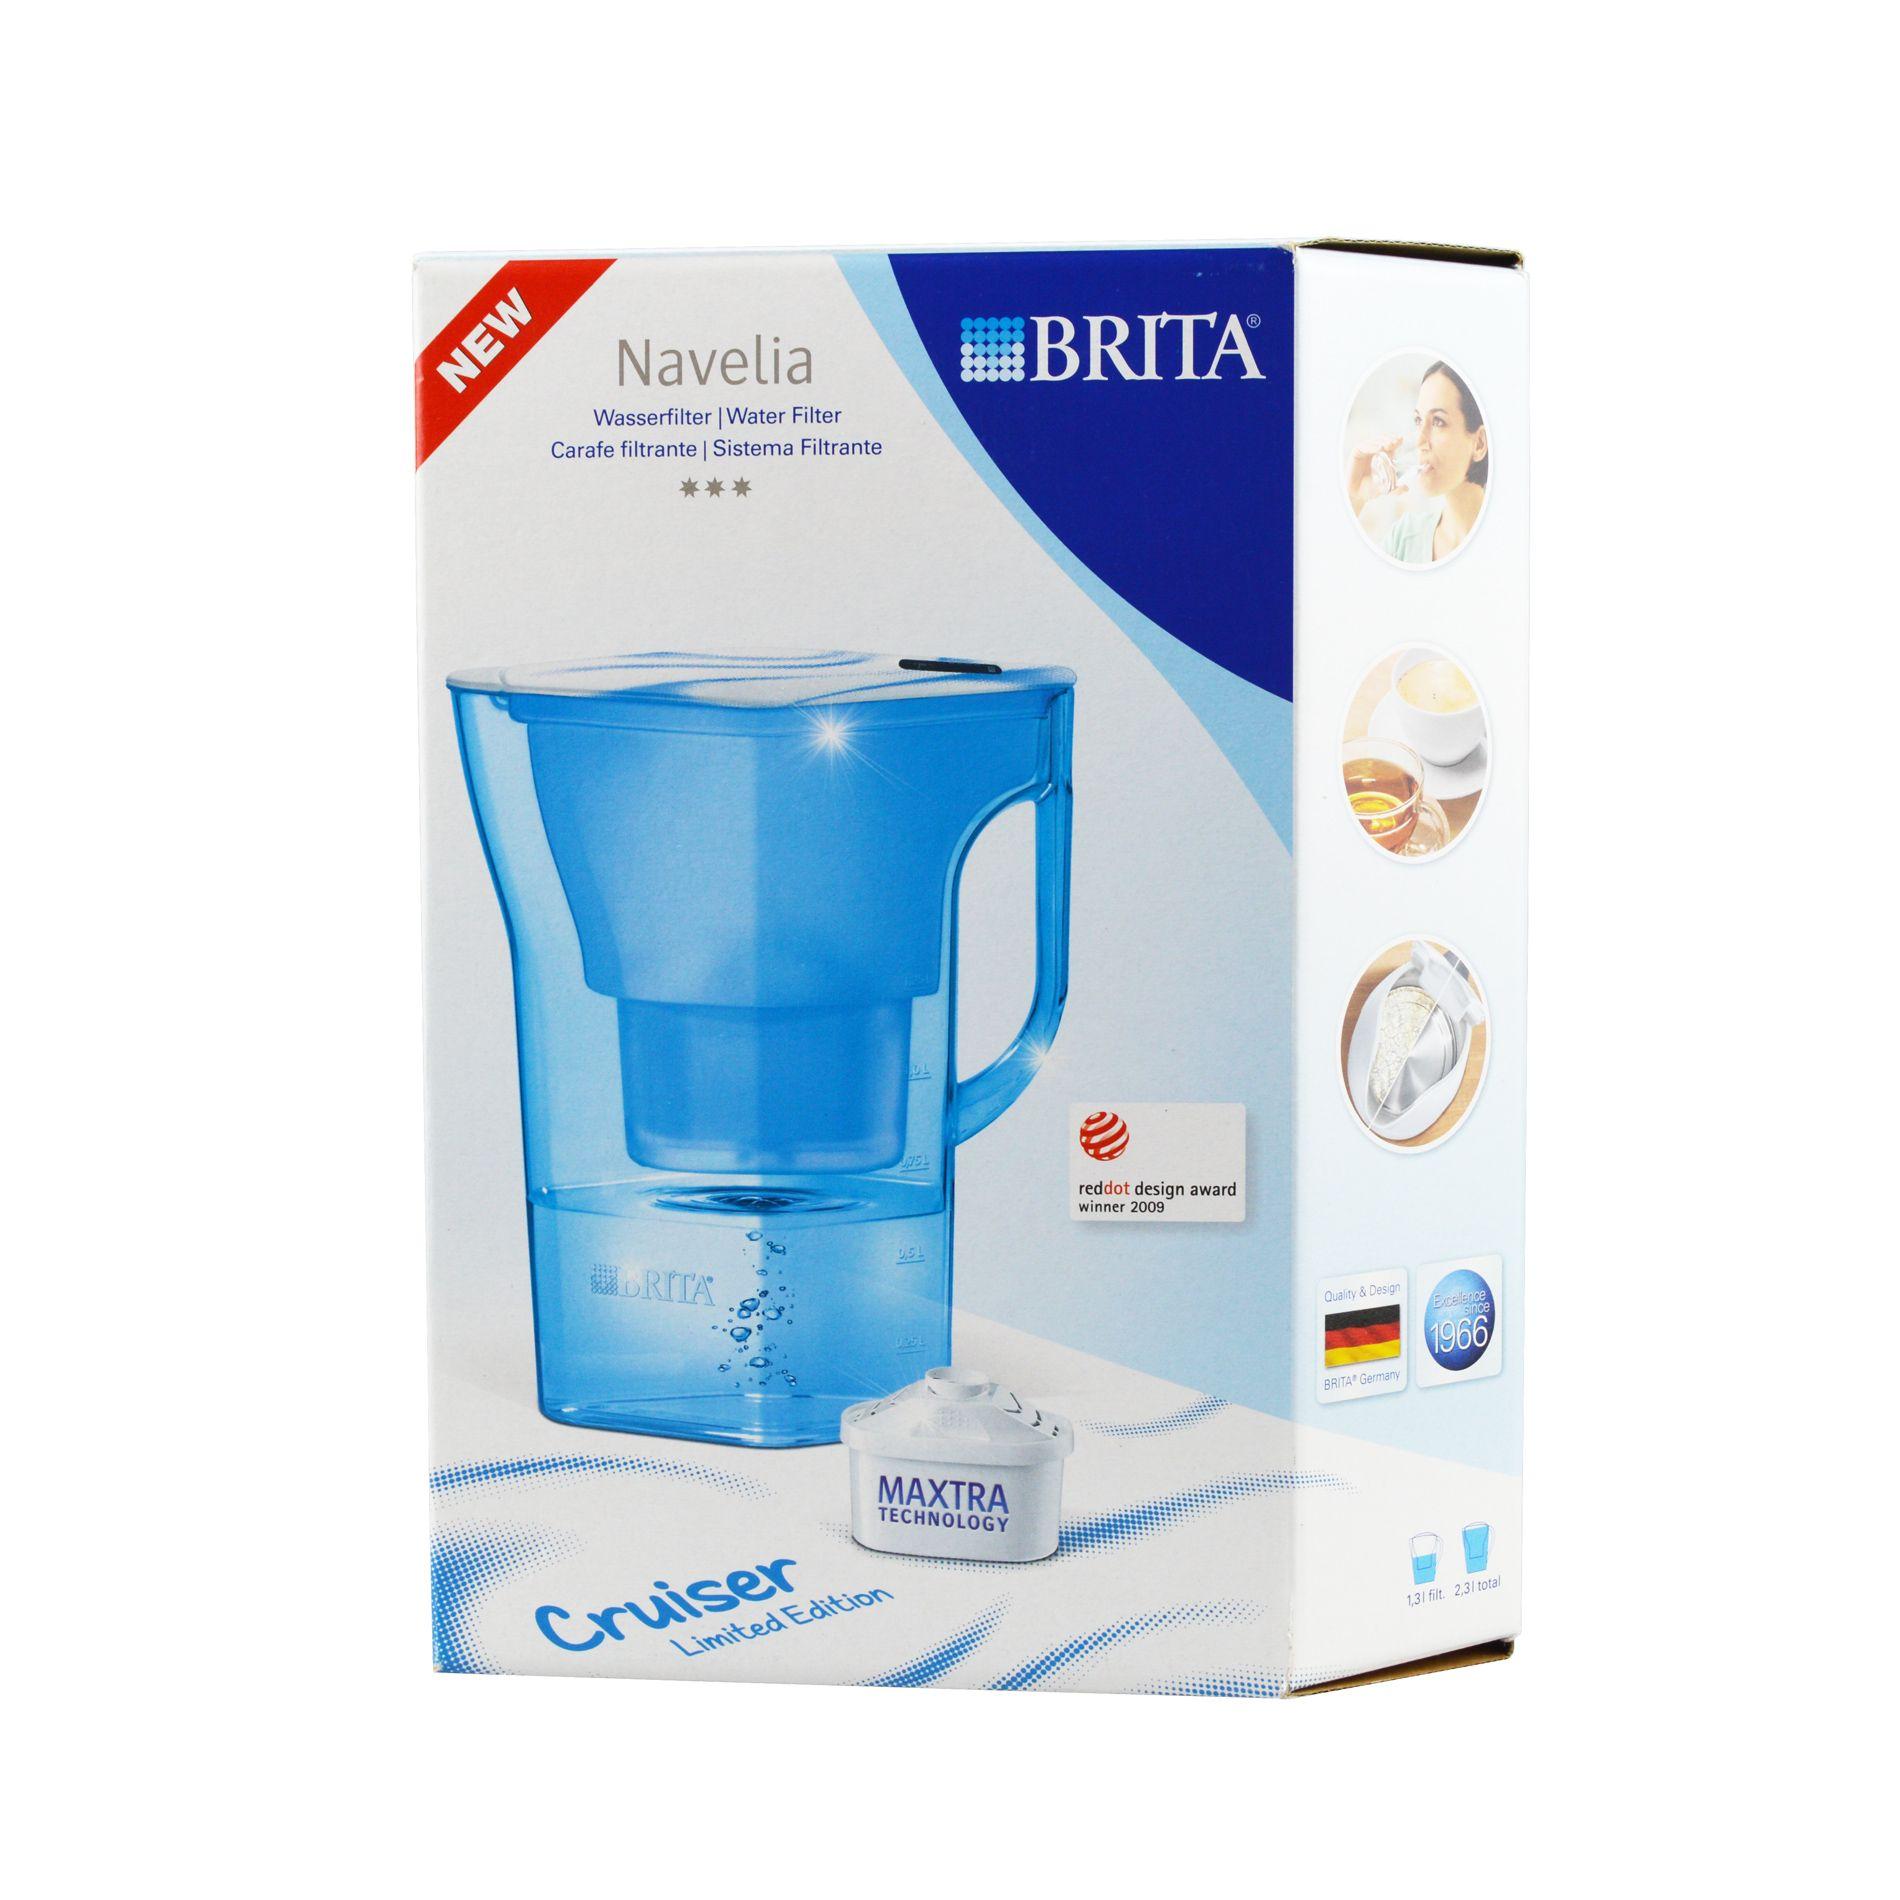 brita filtre eau navelia acheter sur kidsroom alimentation. Black Bedroom Furniture Sets. Home Design Ideas